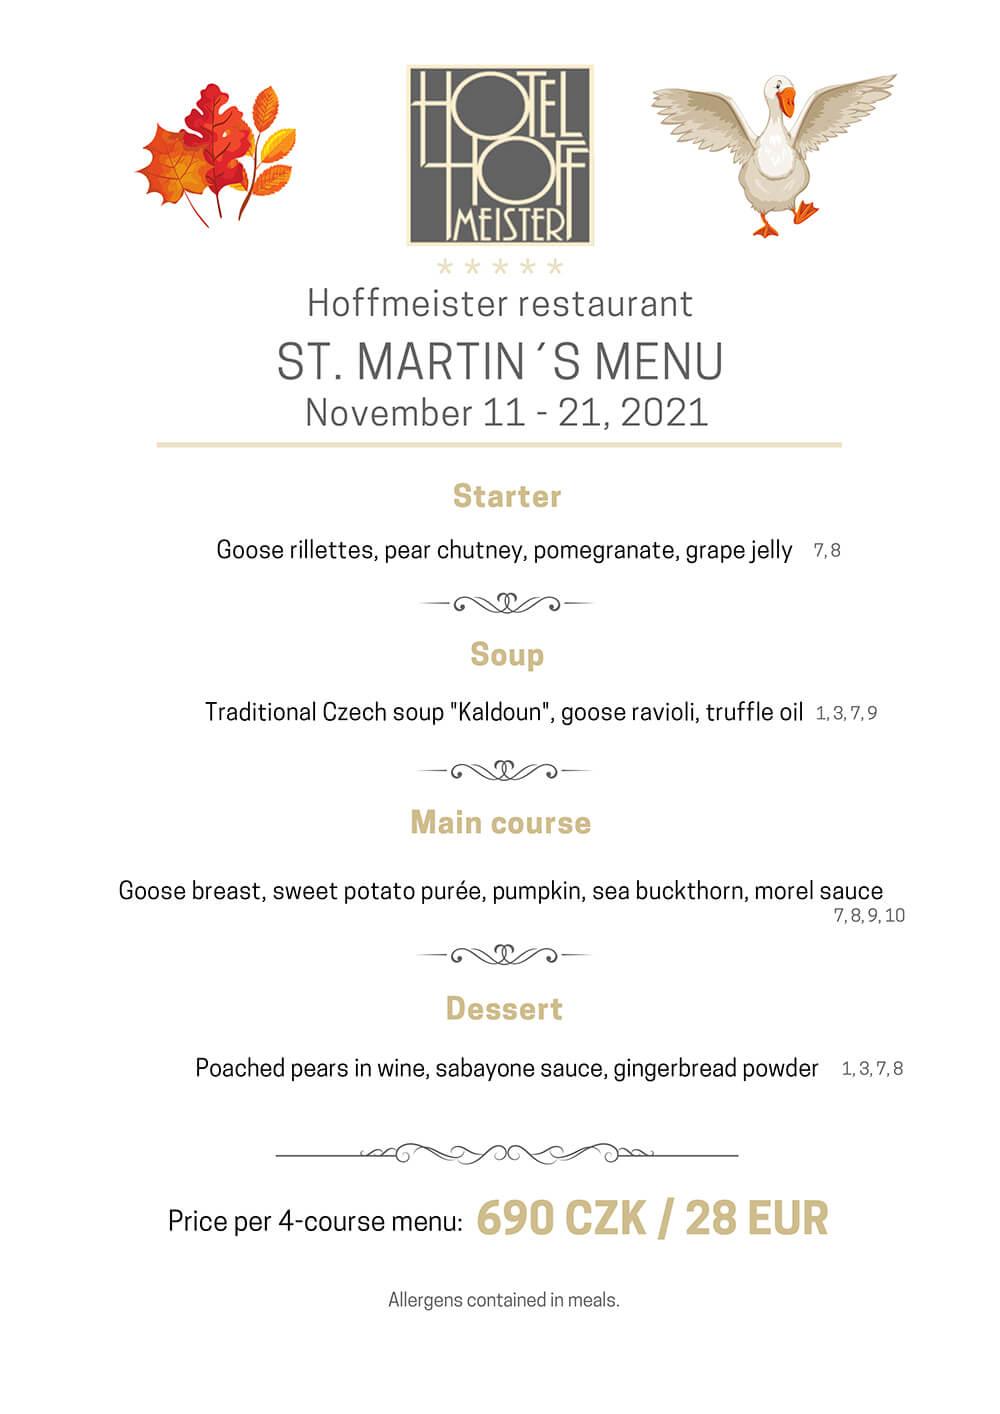 St. Martin's menu